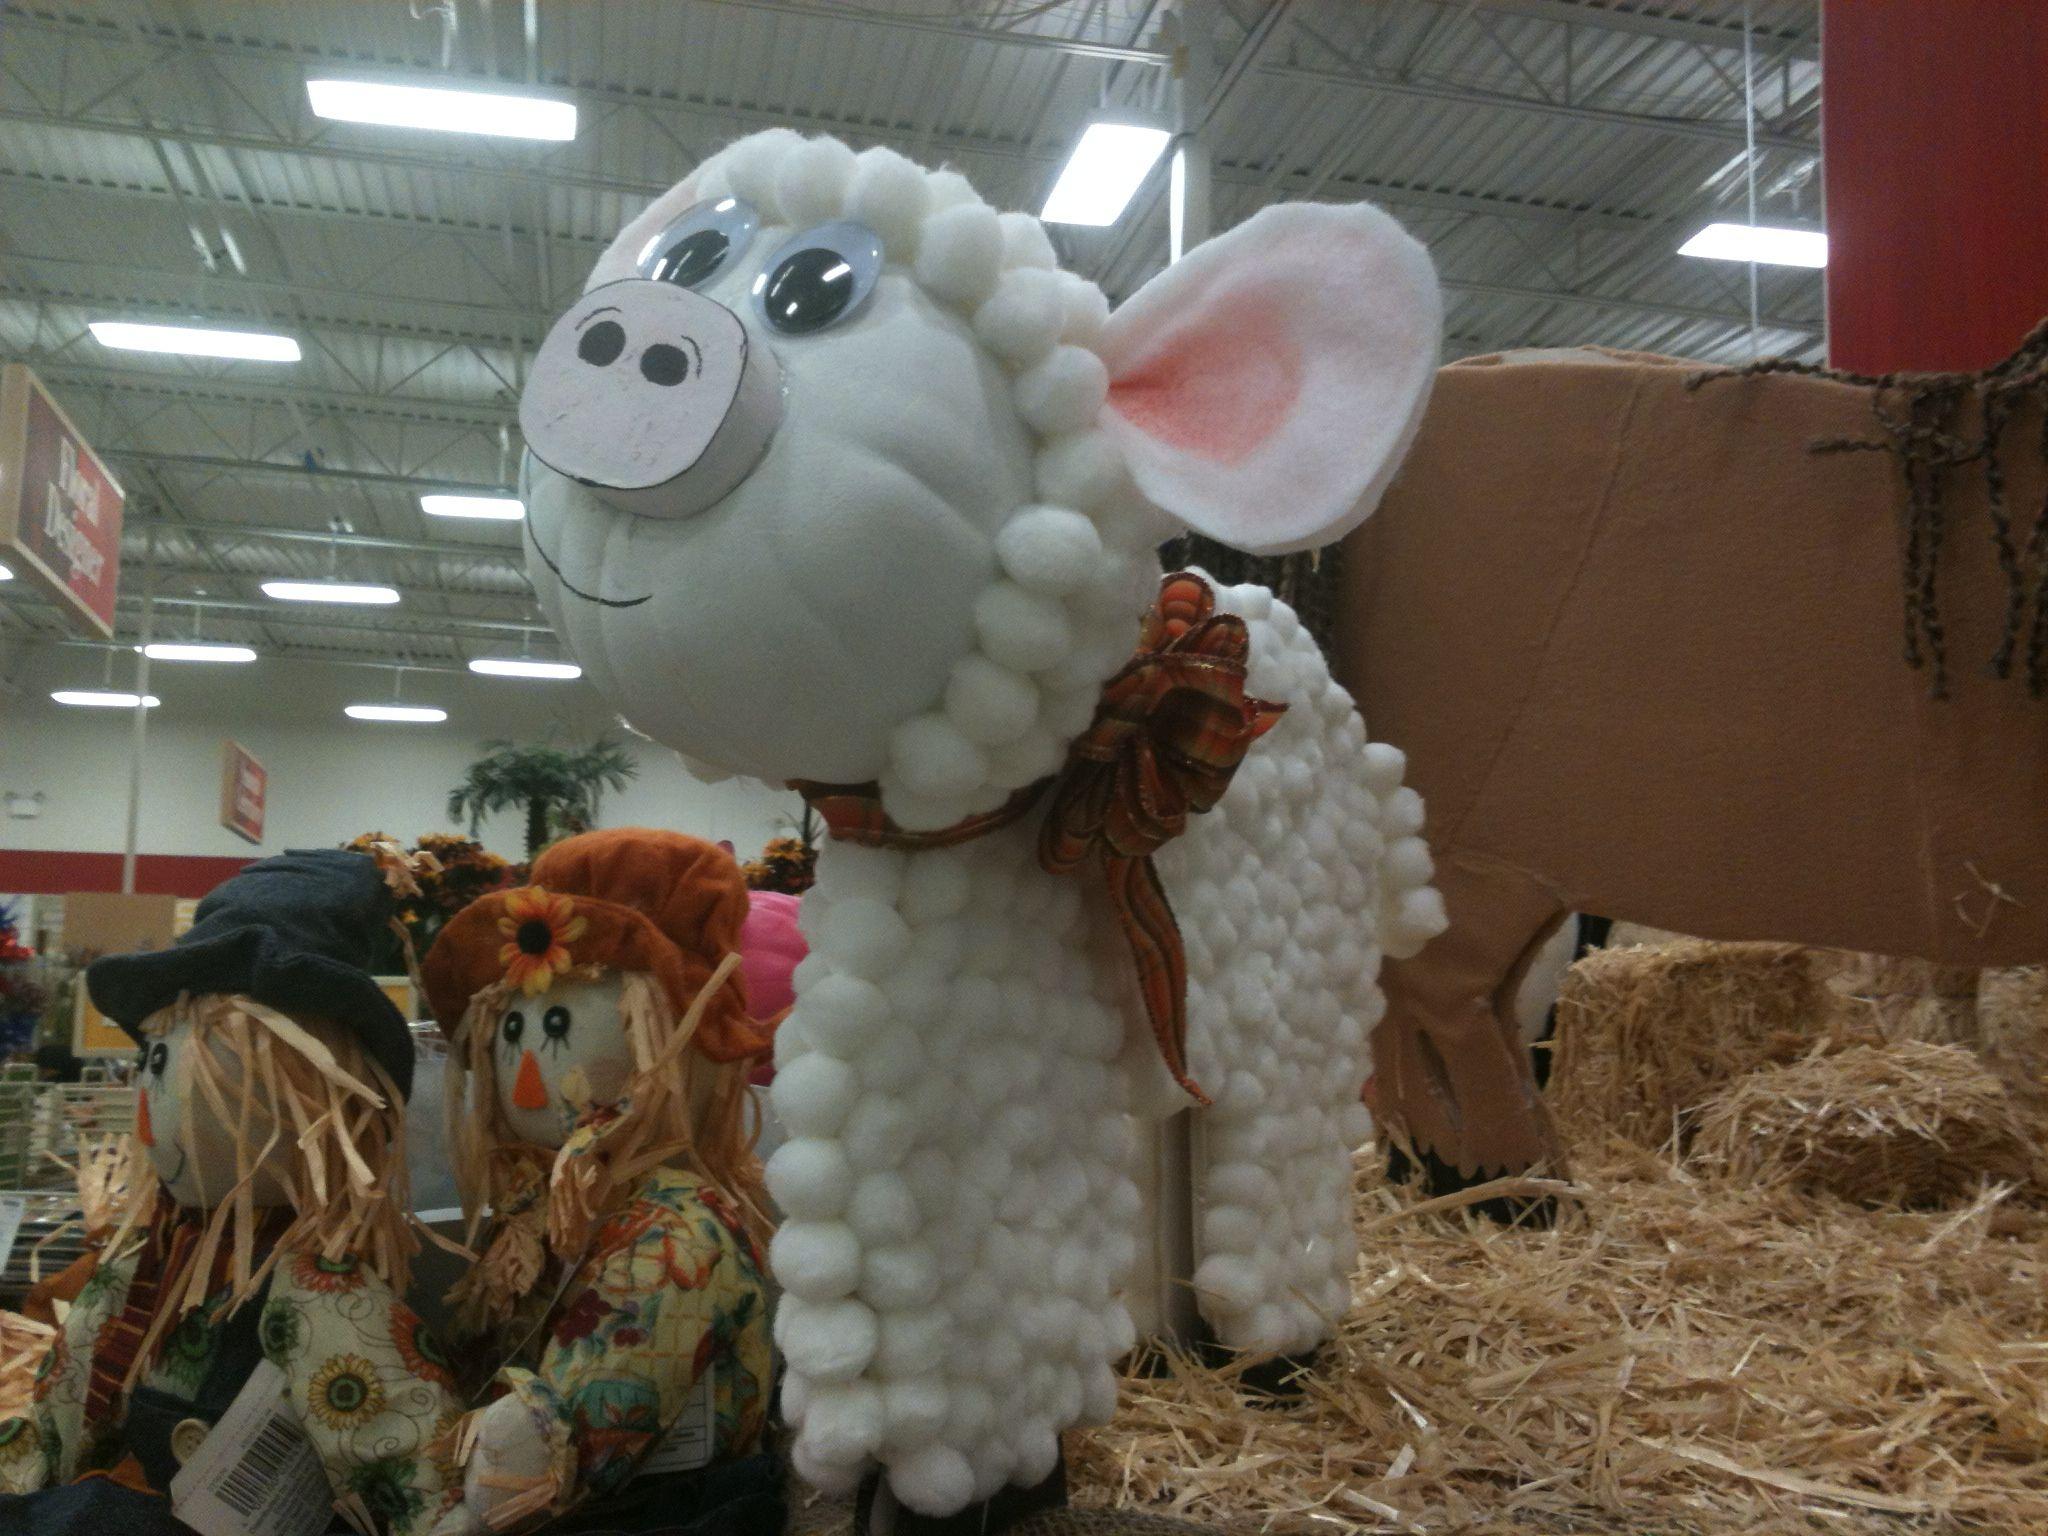 Farm animal lamb made with foam pumpkin and foam core